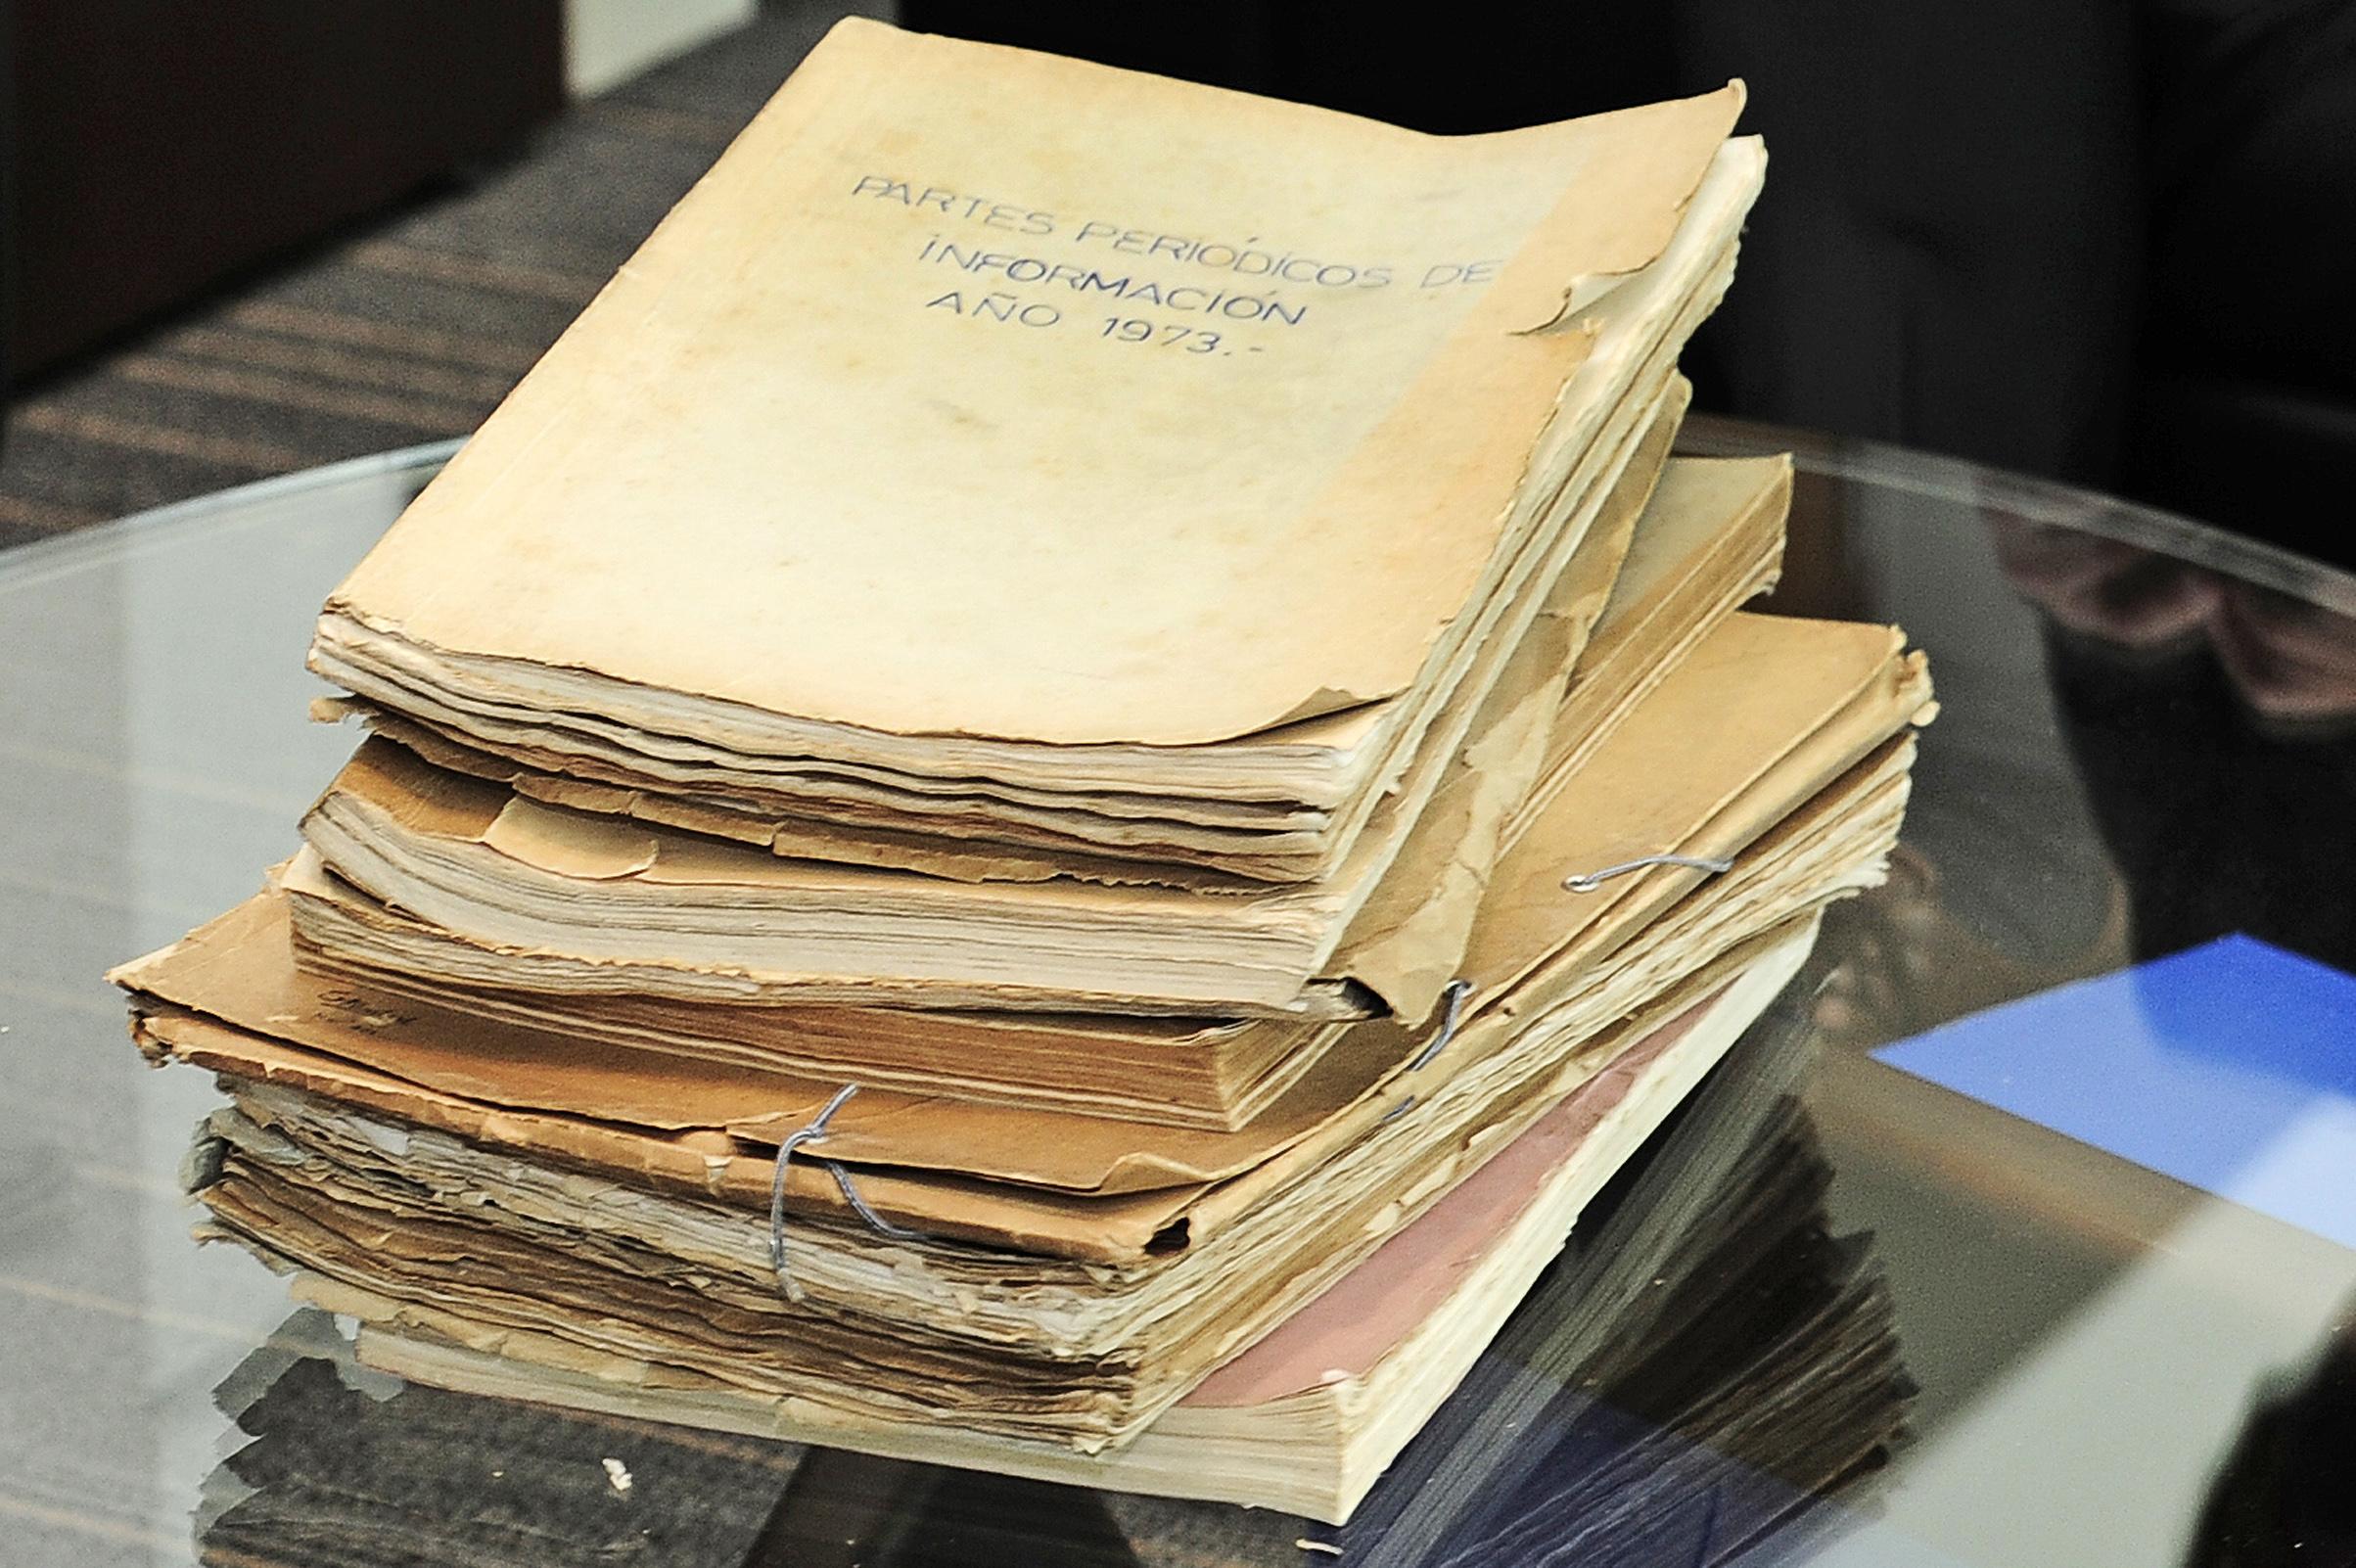 Documentación entregada por autoridades nacionales